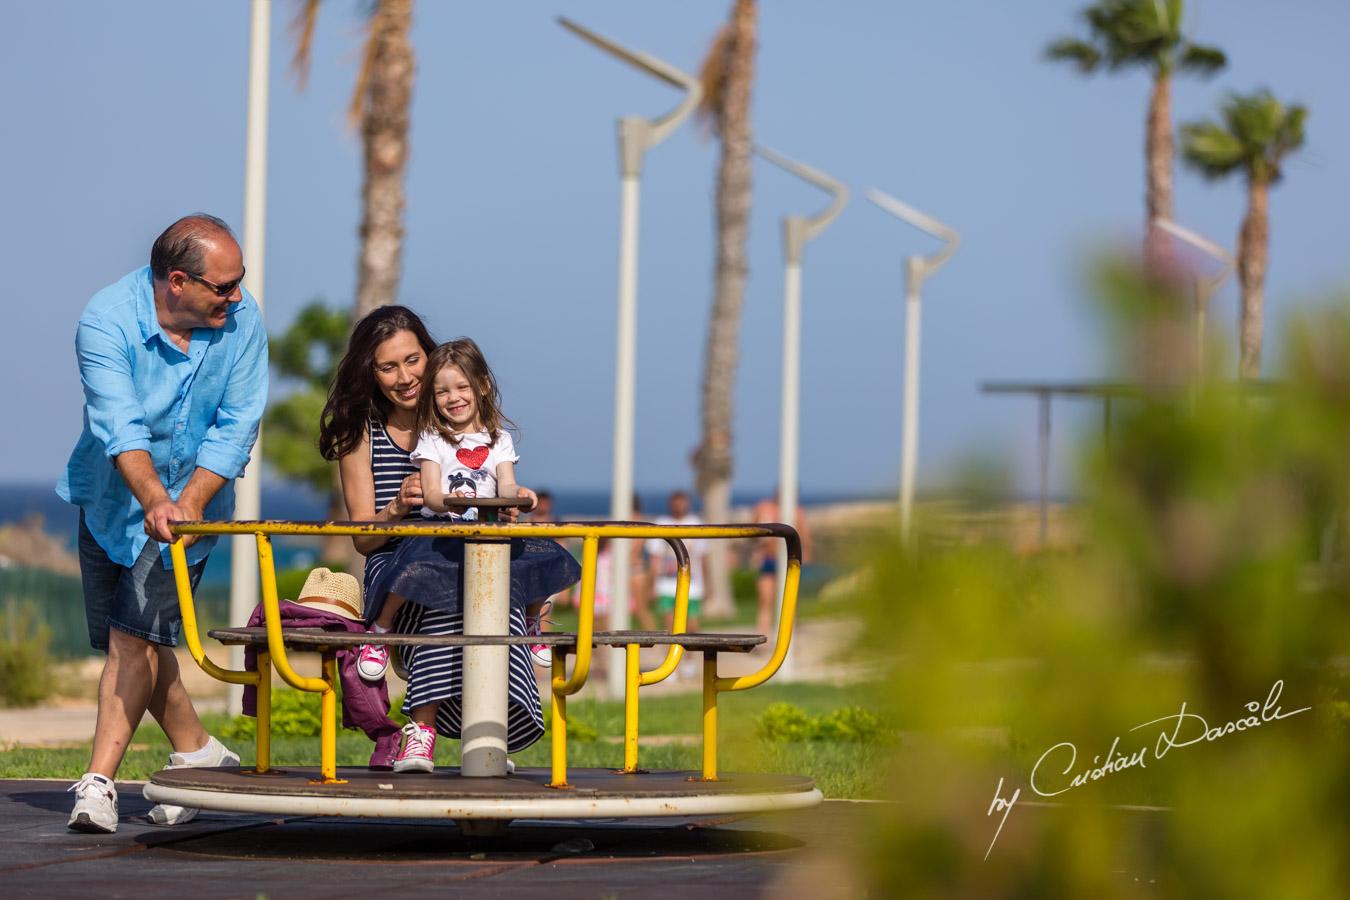 A Family Photo Shoot in Protaras, Cyprus - 11